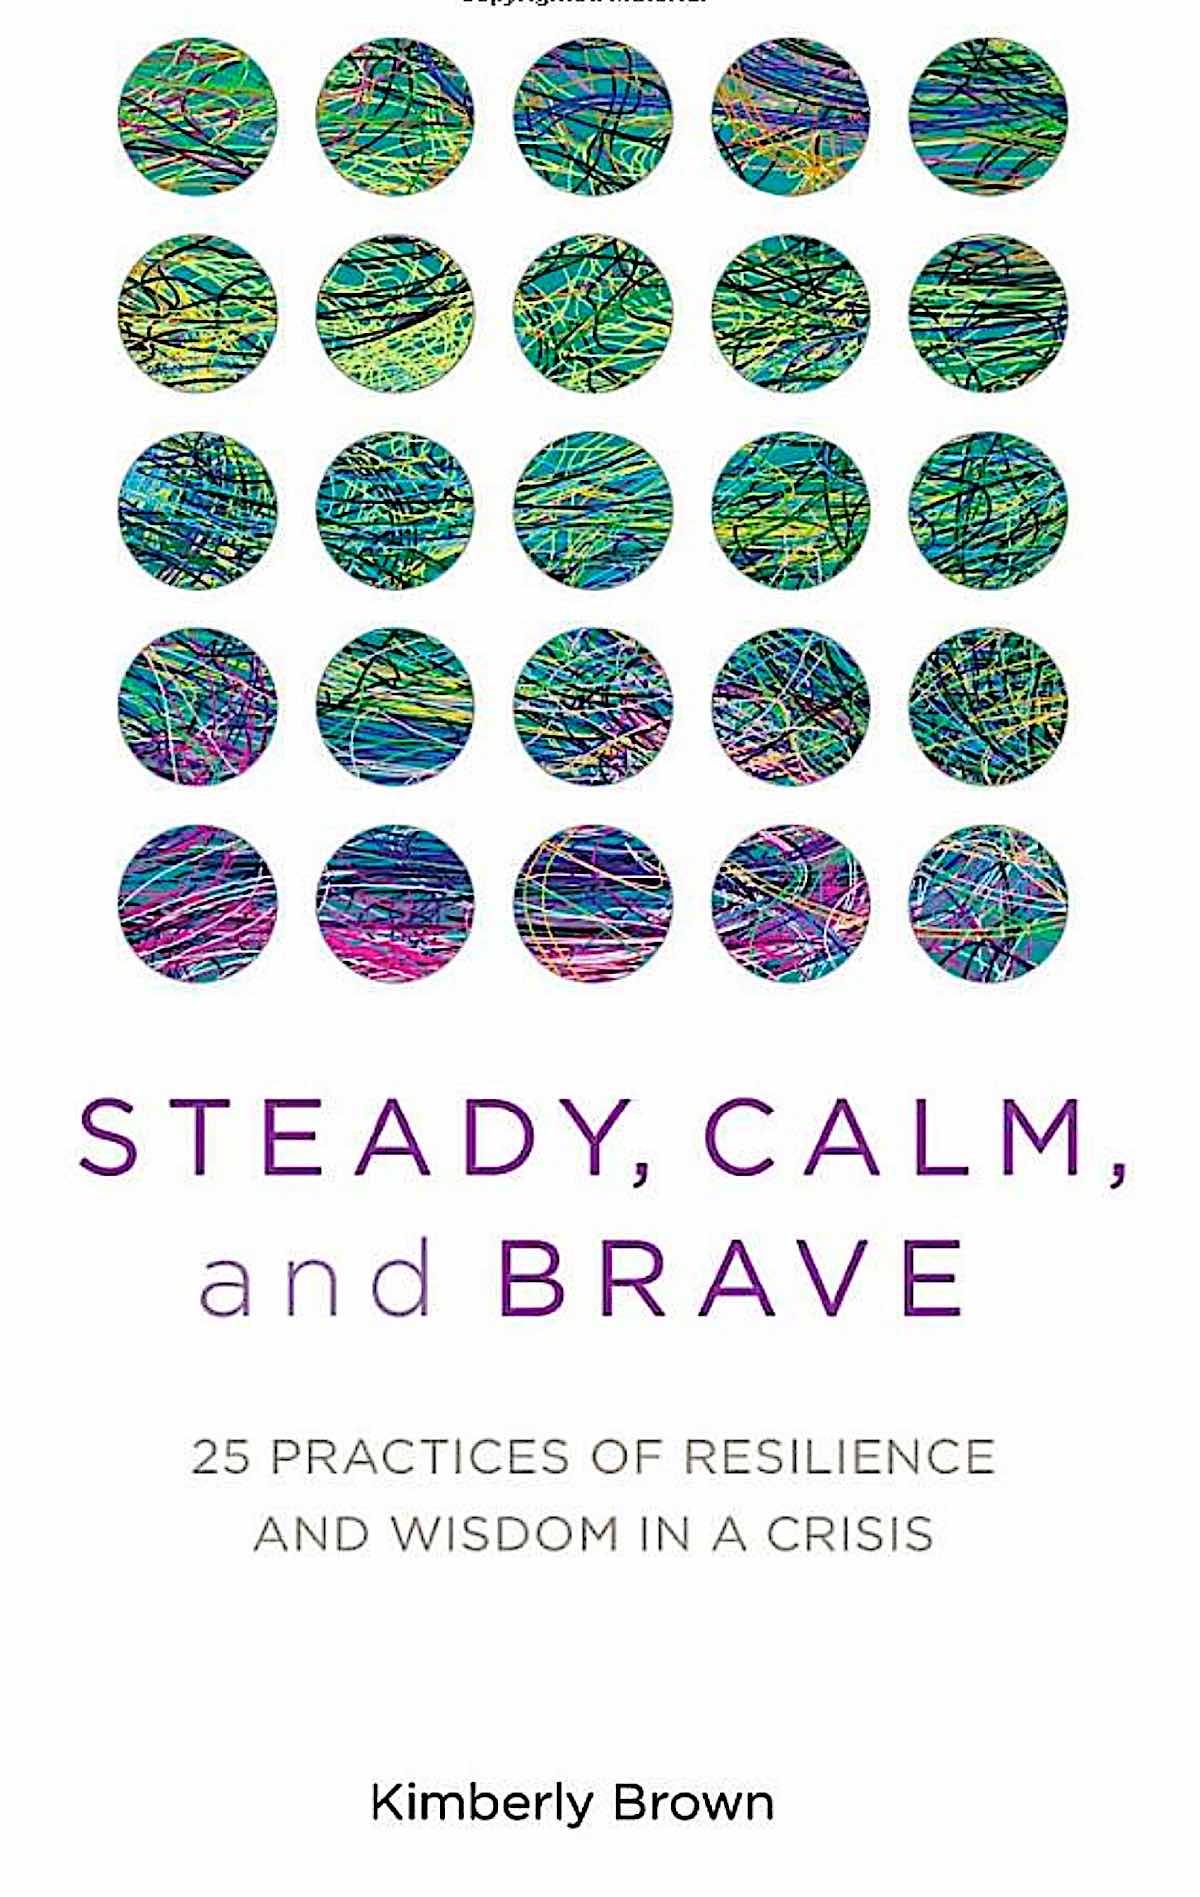 Buddha Weekly Steady Calm and Brave book Kimberly Brown Buddhism